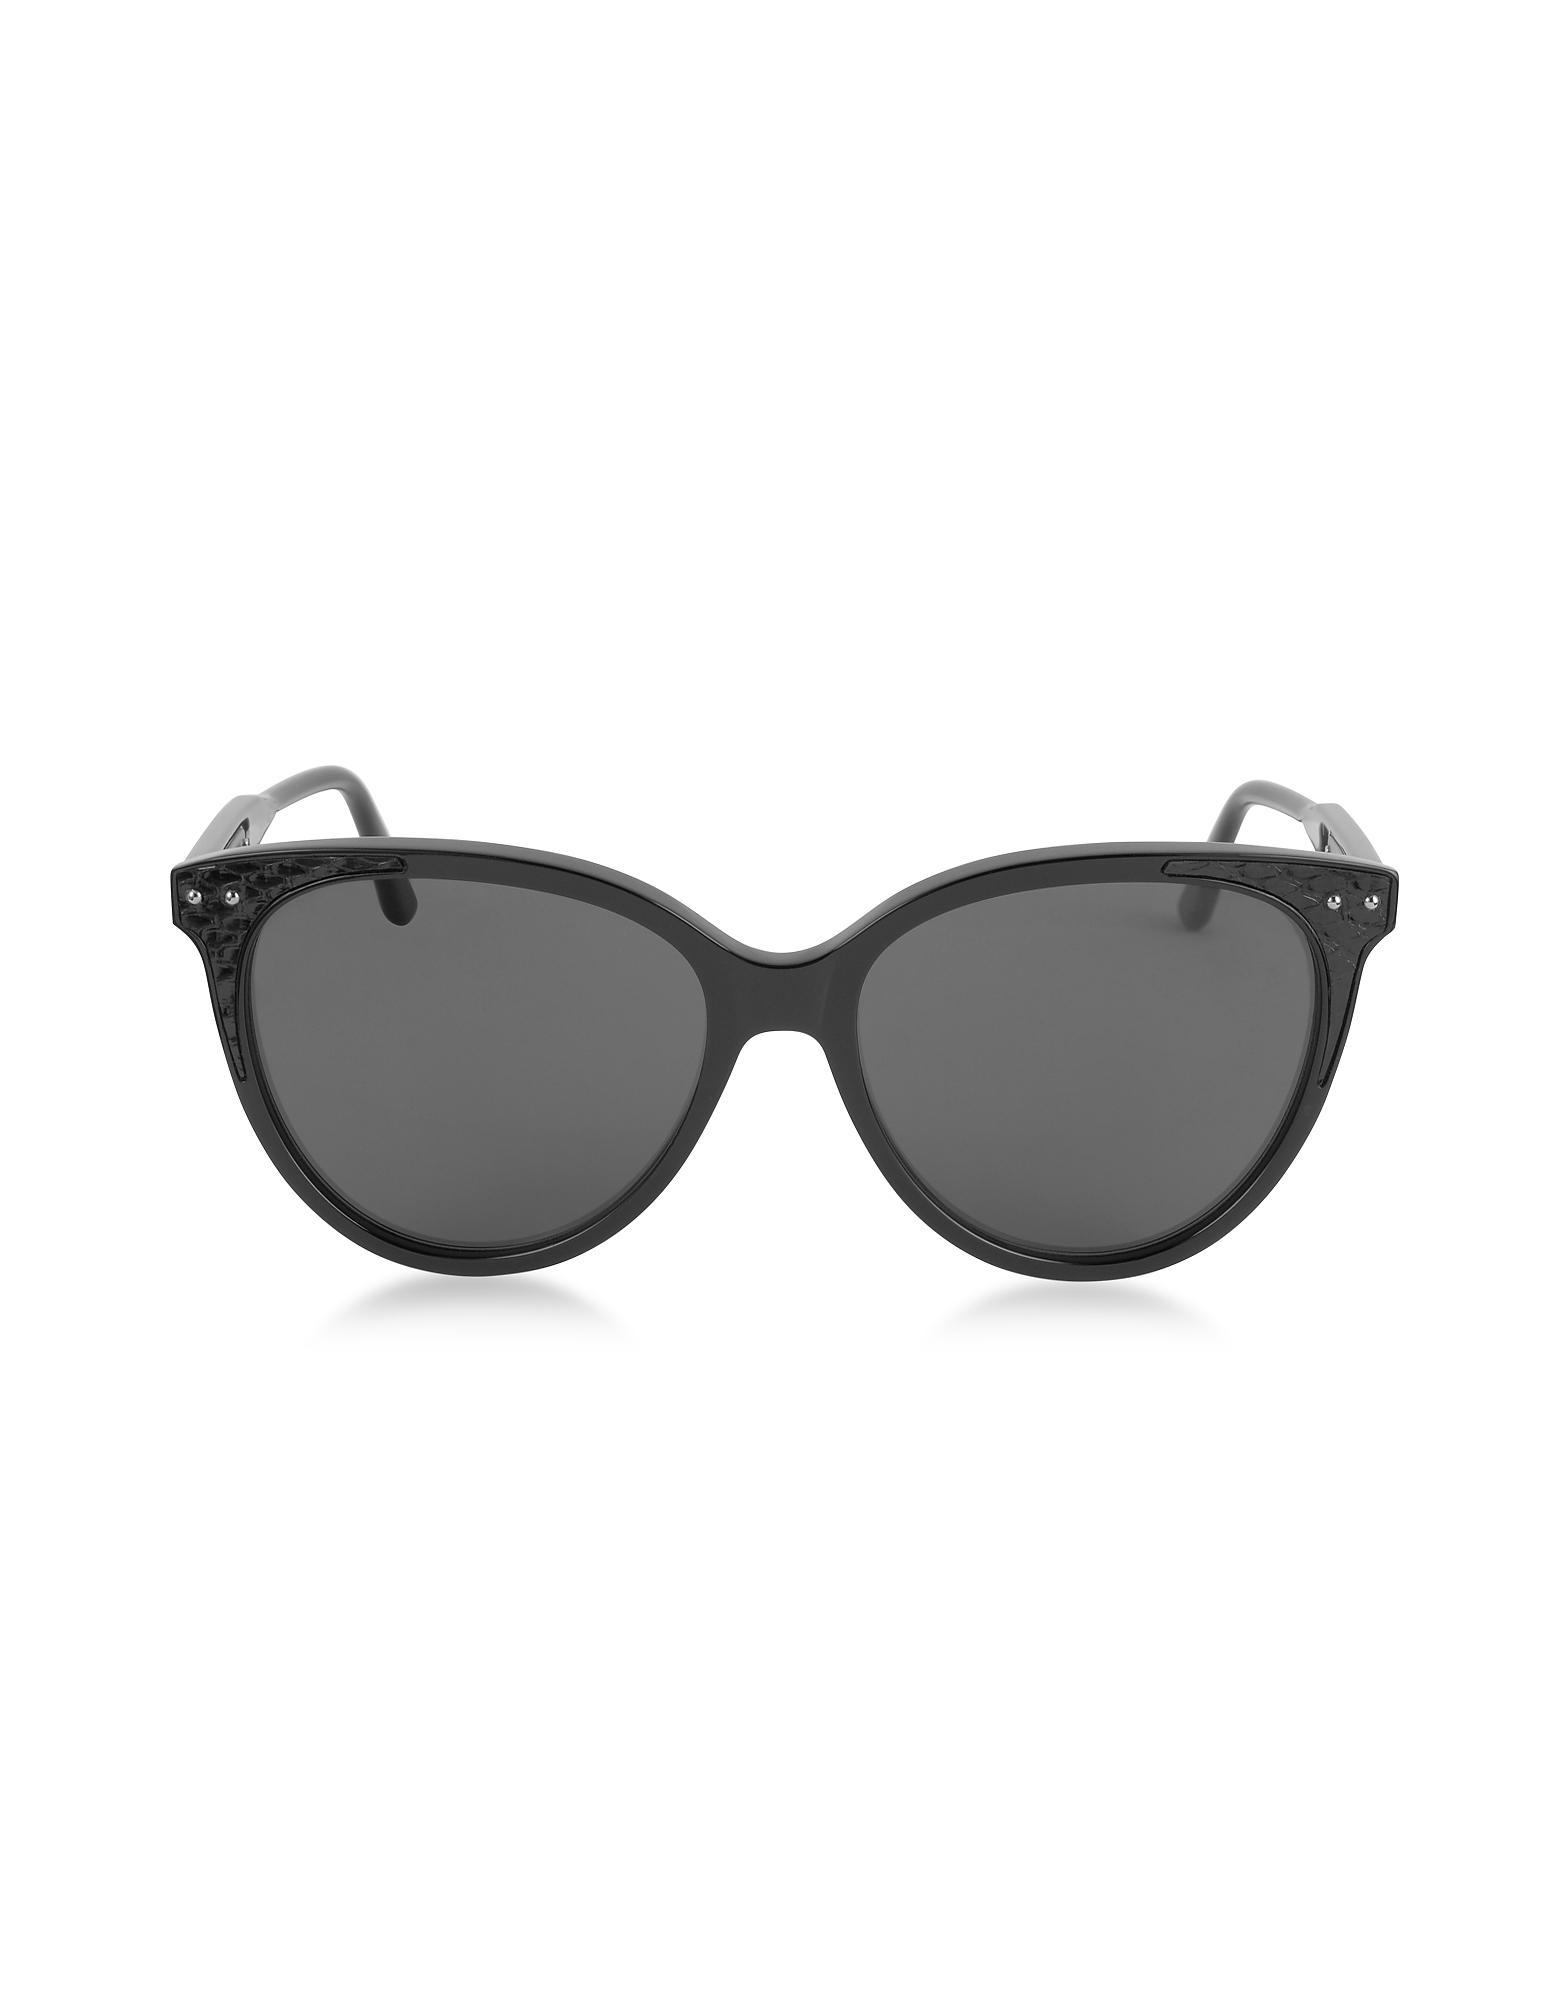 28f5b026e52 Bottega Veneta. Black Bv0119s Acetate Cat-eye Frame Women s Sunglasses